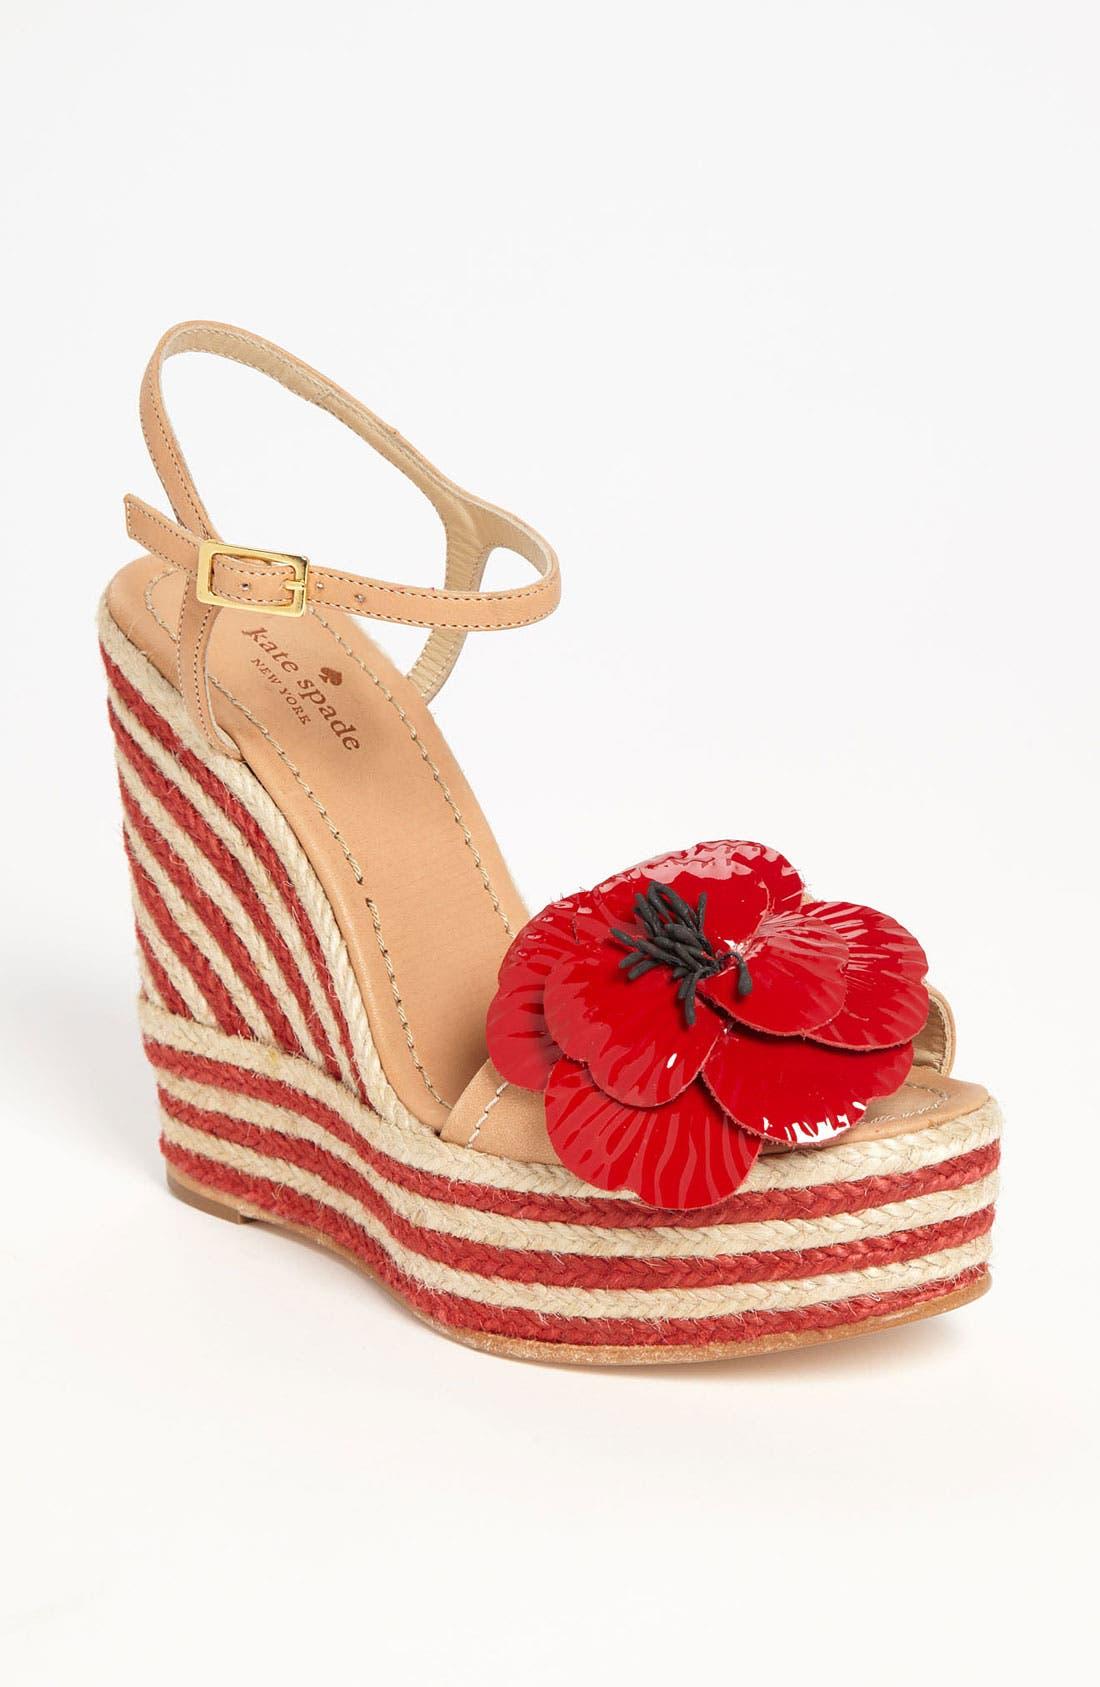 Main Image - kate spade new york 'lainey' wedge sandal